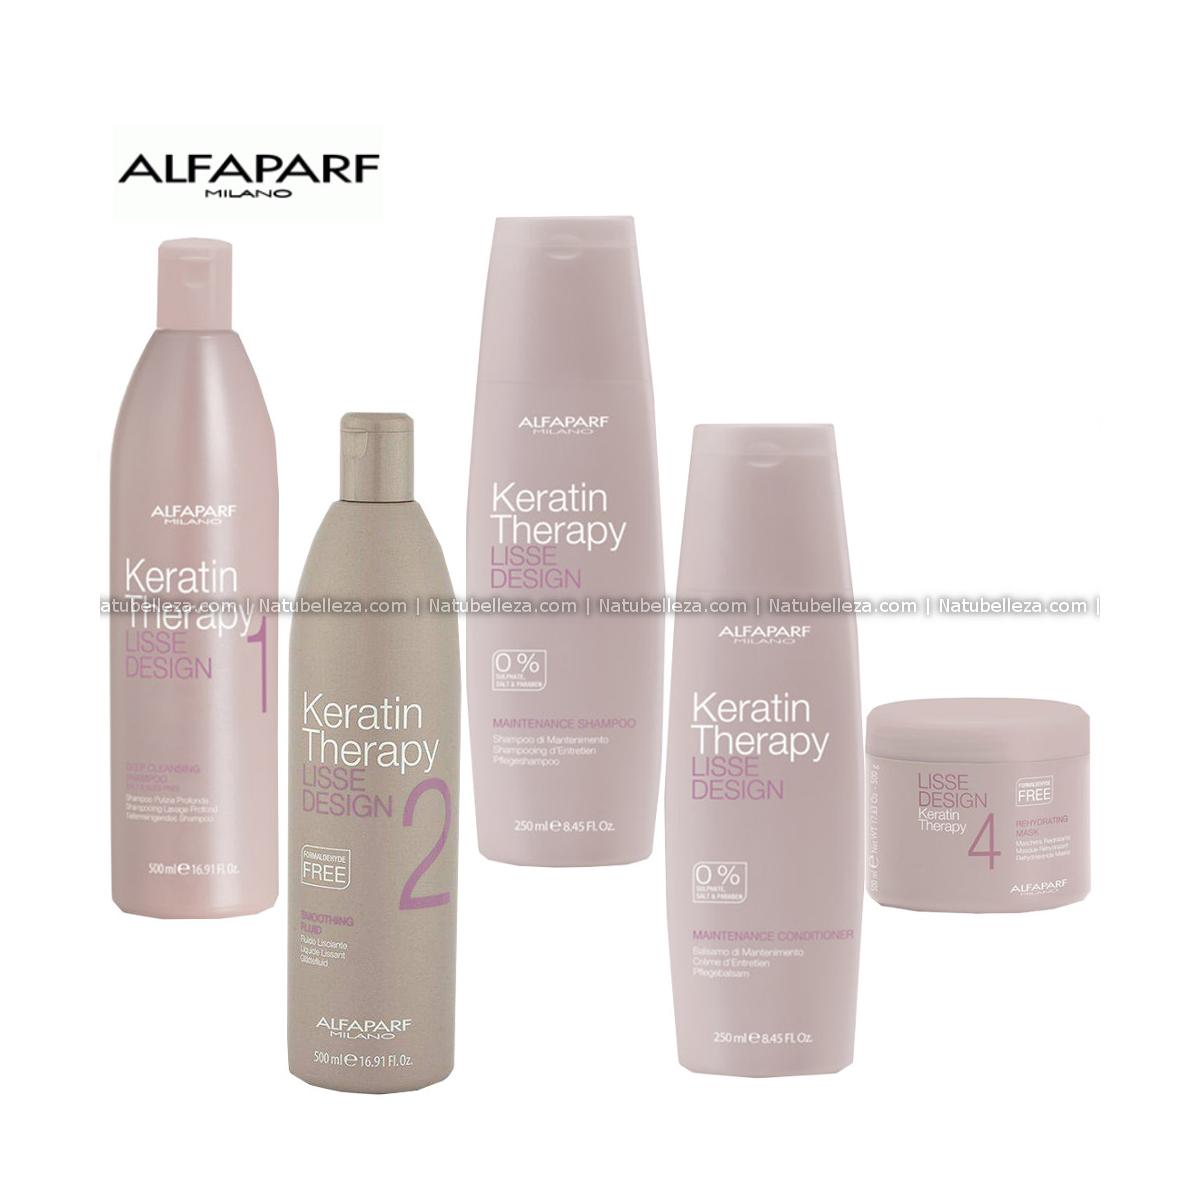 Lisse Design Keratin Therapy Kit Professional Alfaparf